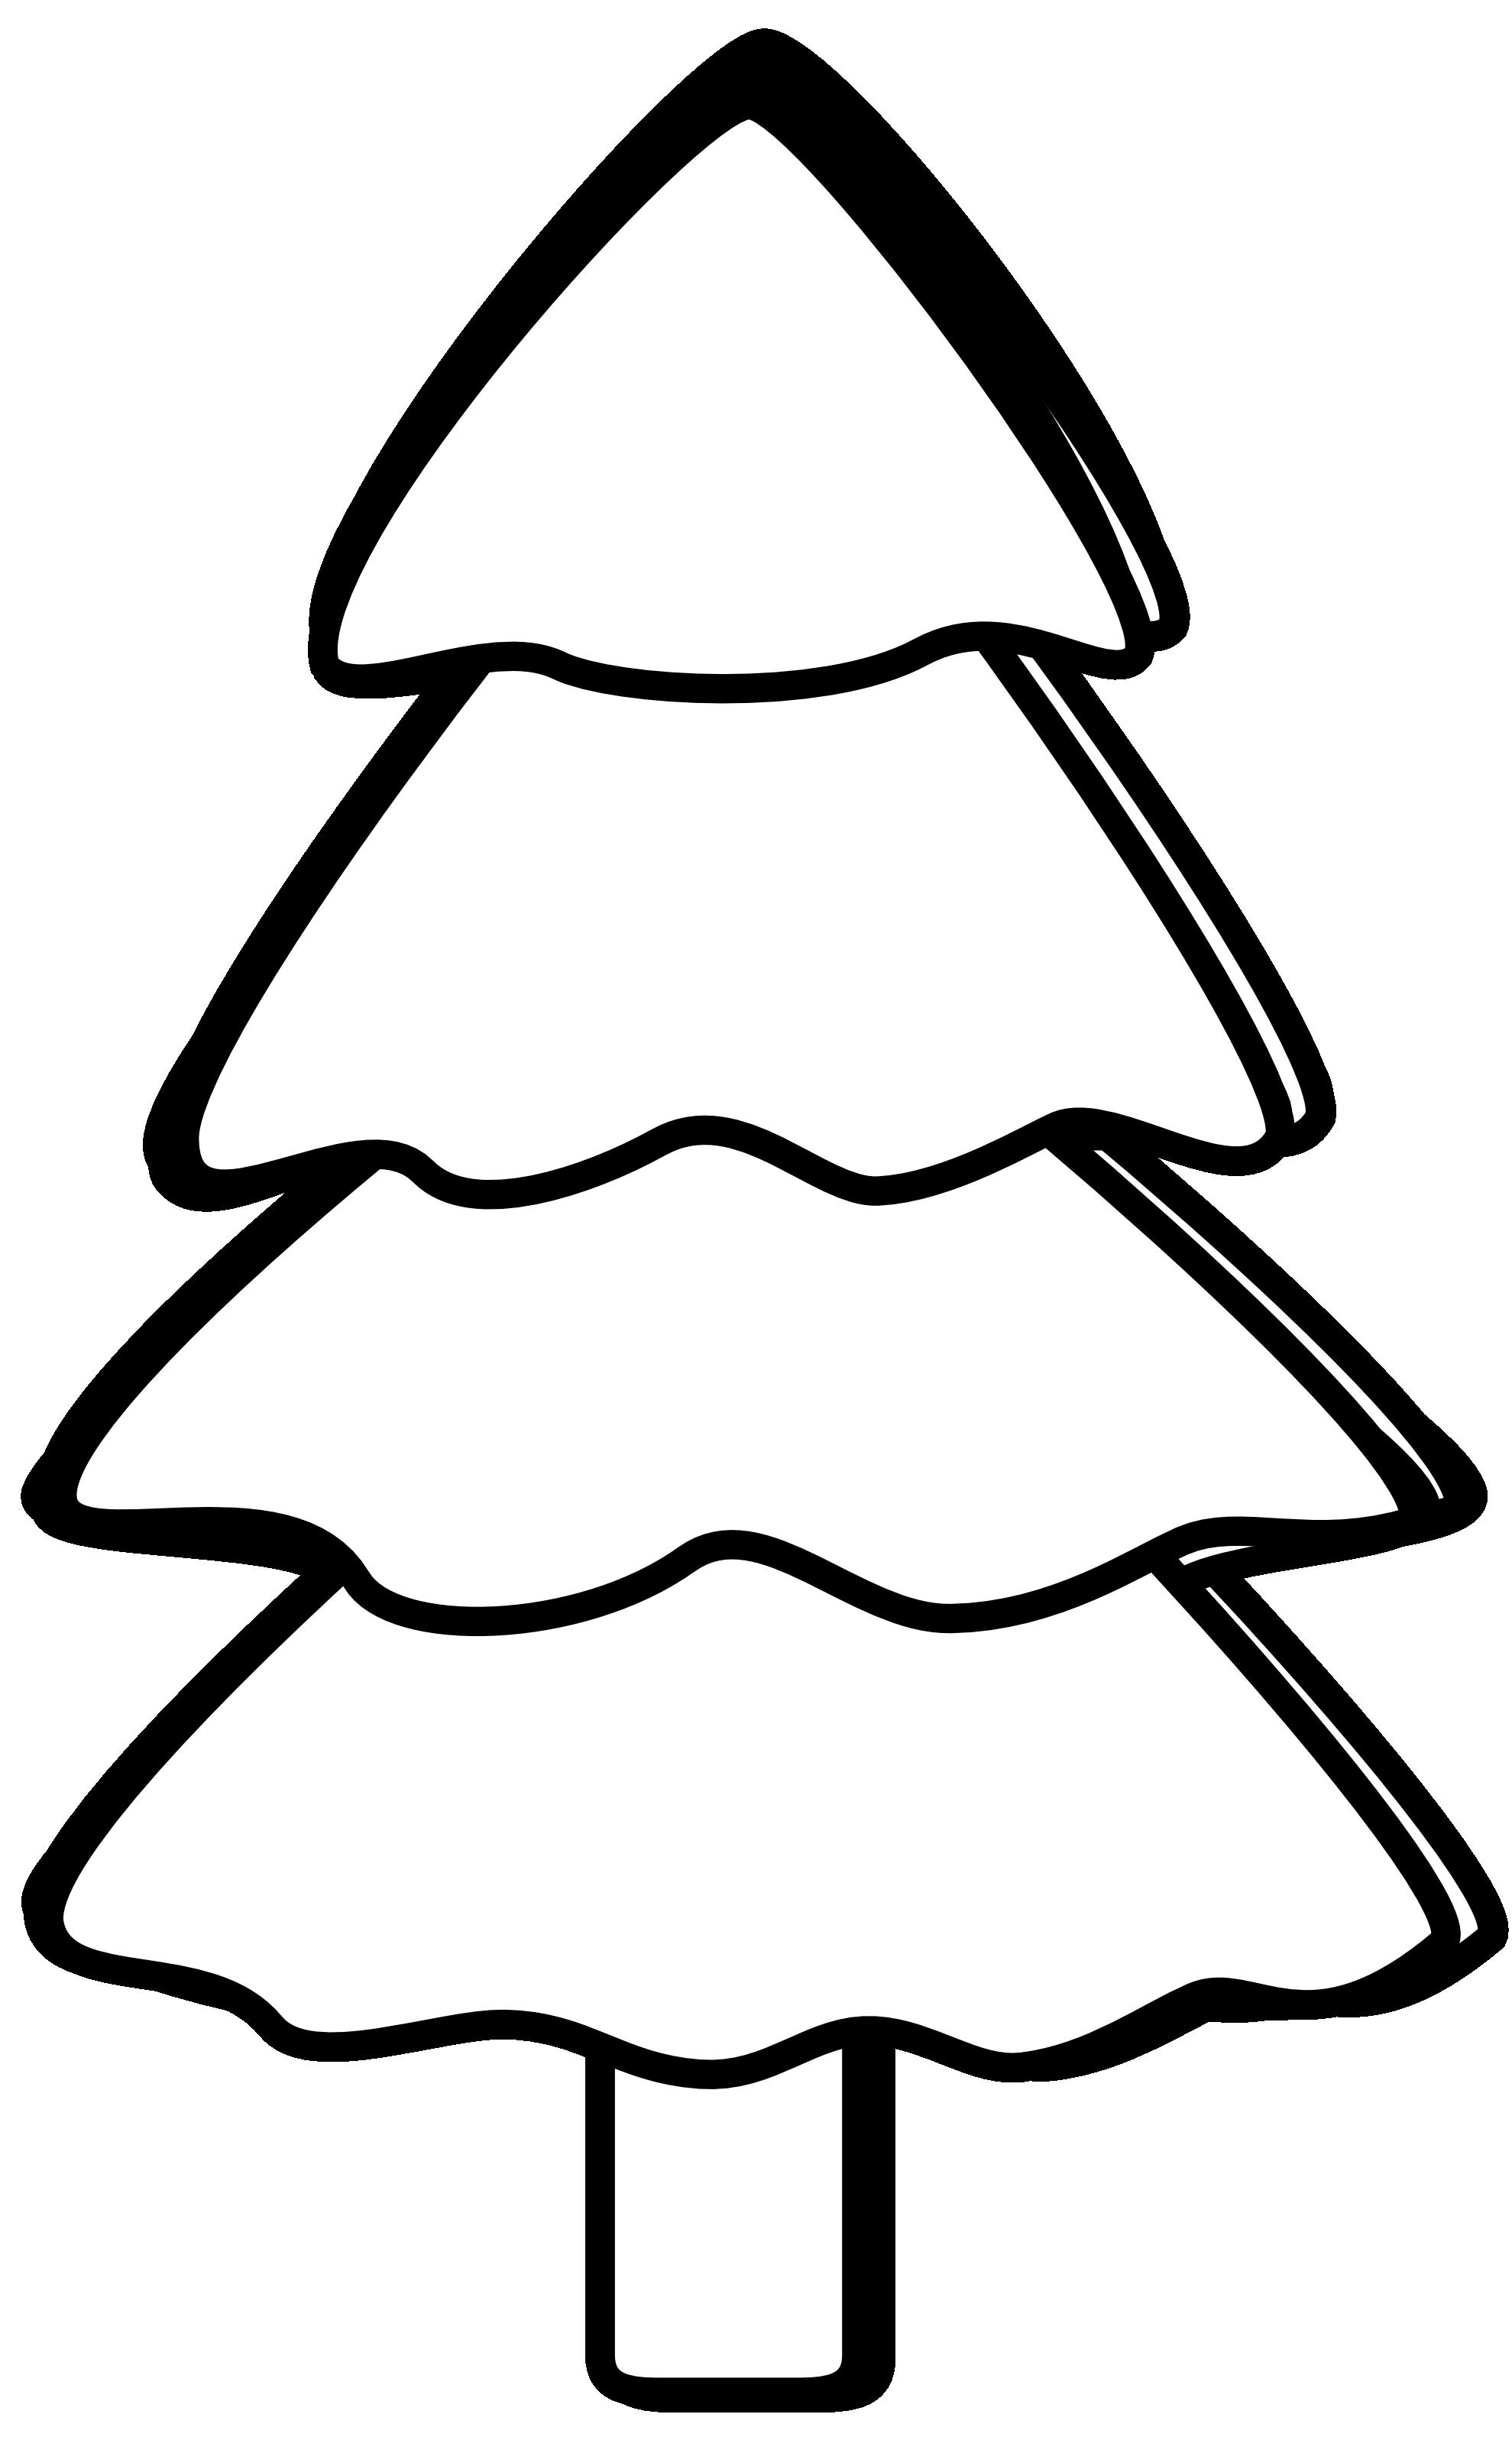 Blackandwhite, often abbreviated B/W or B&W, is a term